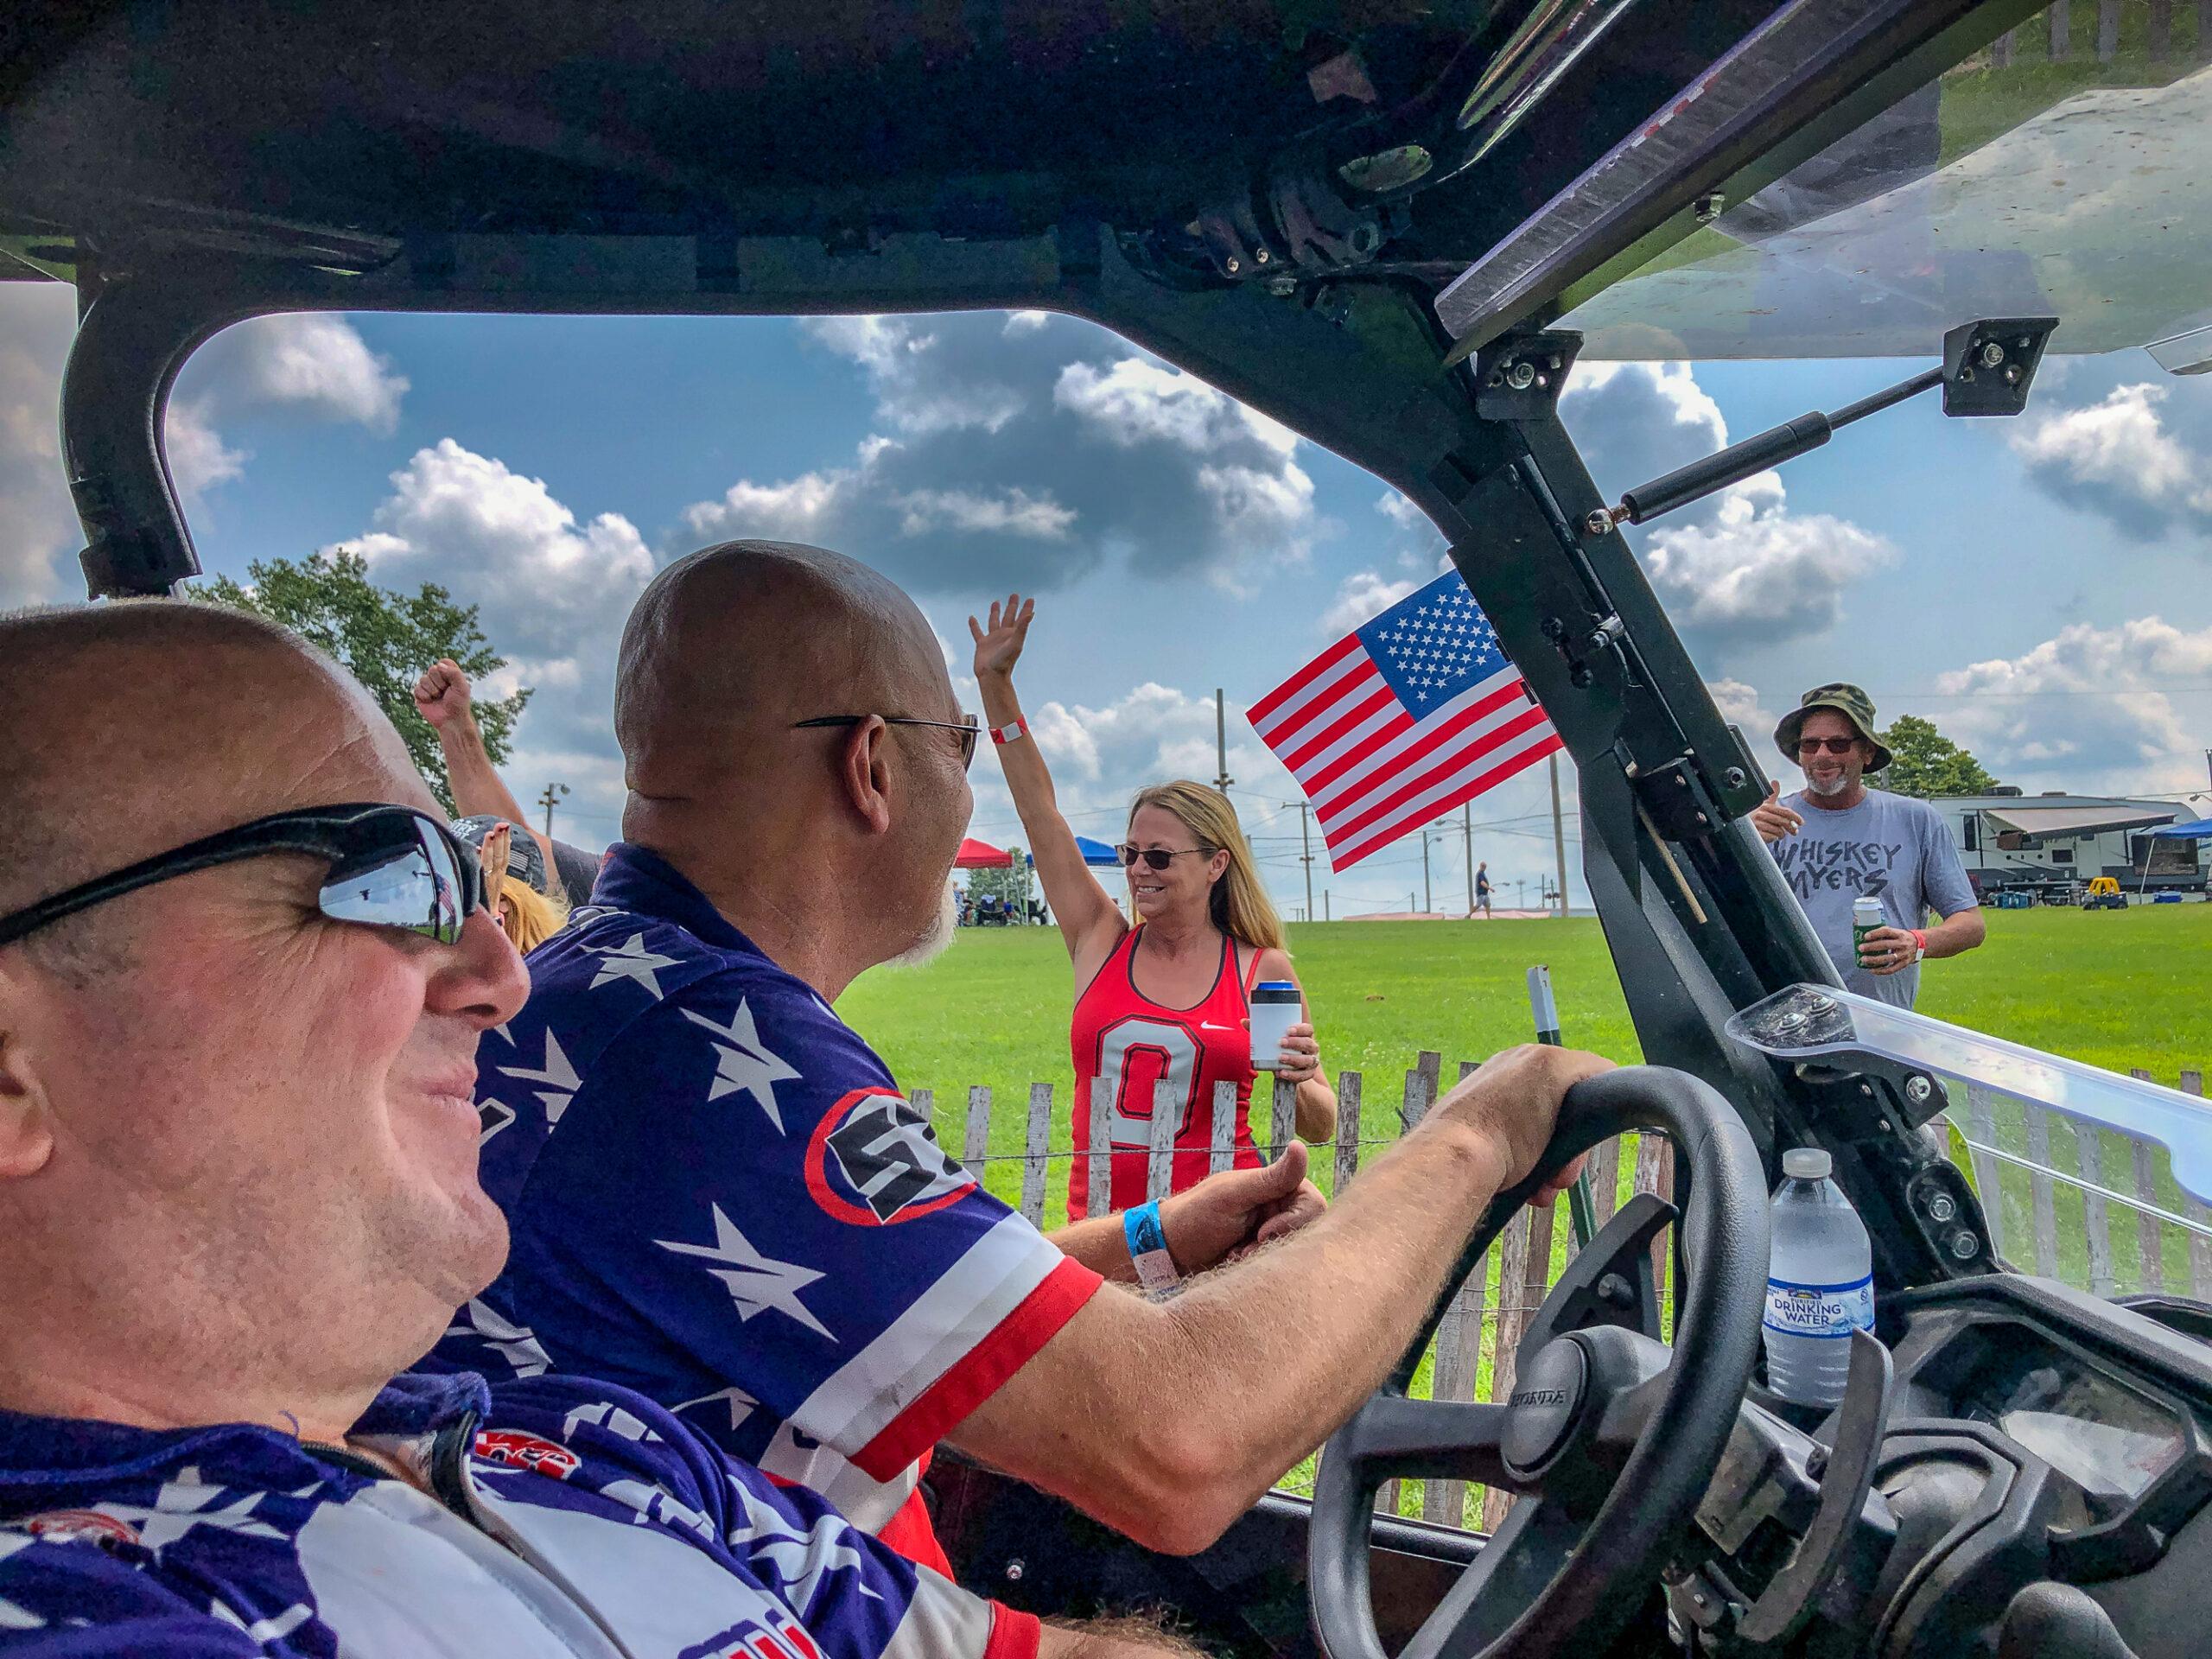 McMurray Racing Nashville Marine 2021 Springfield F1 Race-43